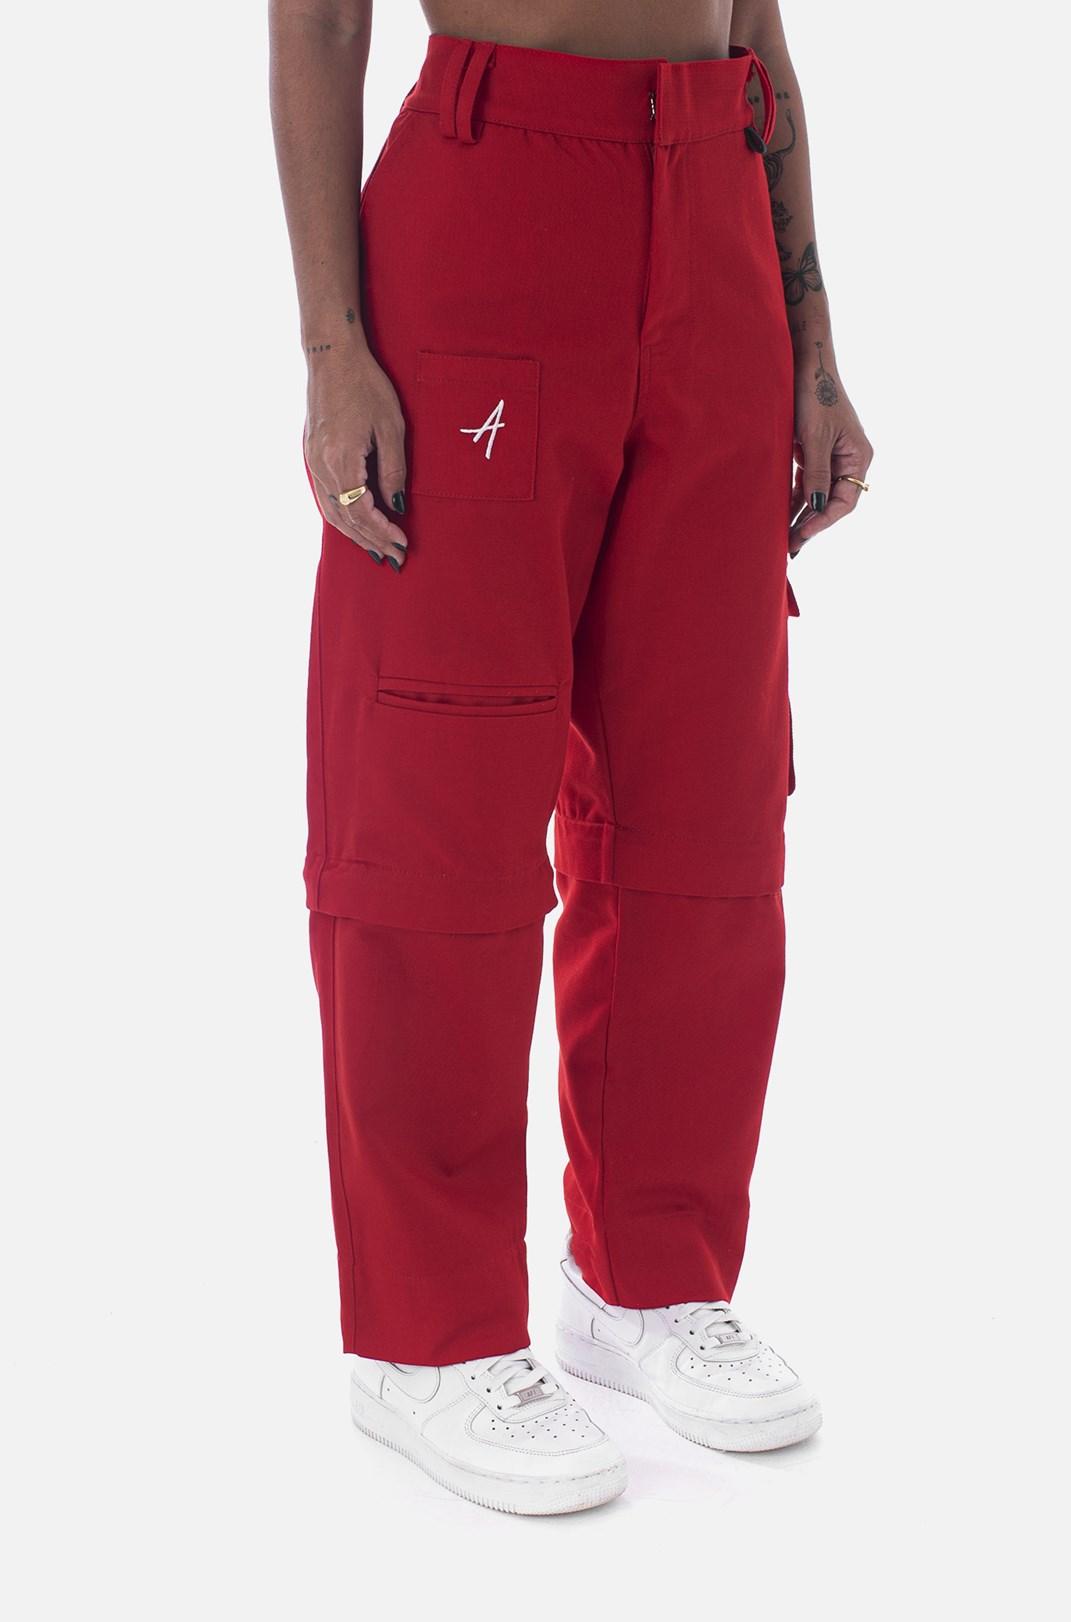 Calça Cargo Approve Workwear Vermelha